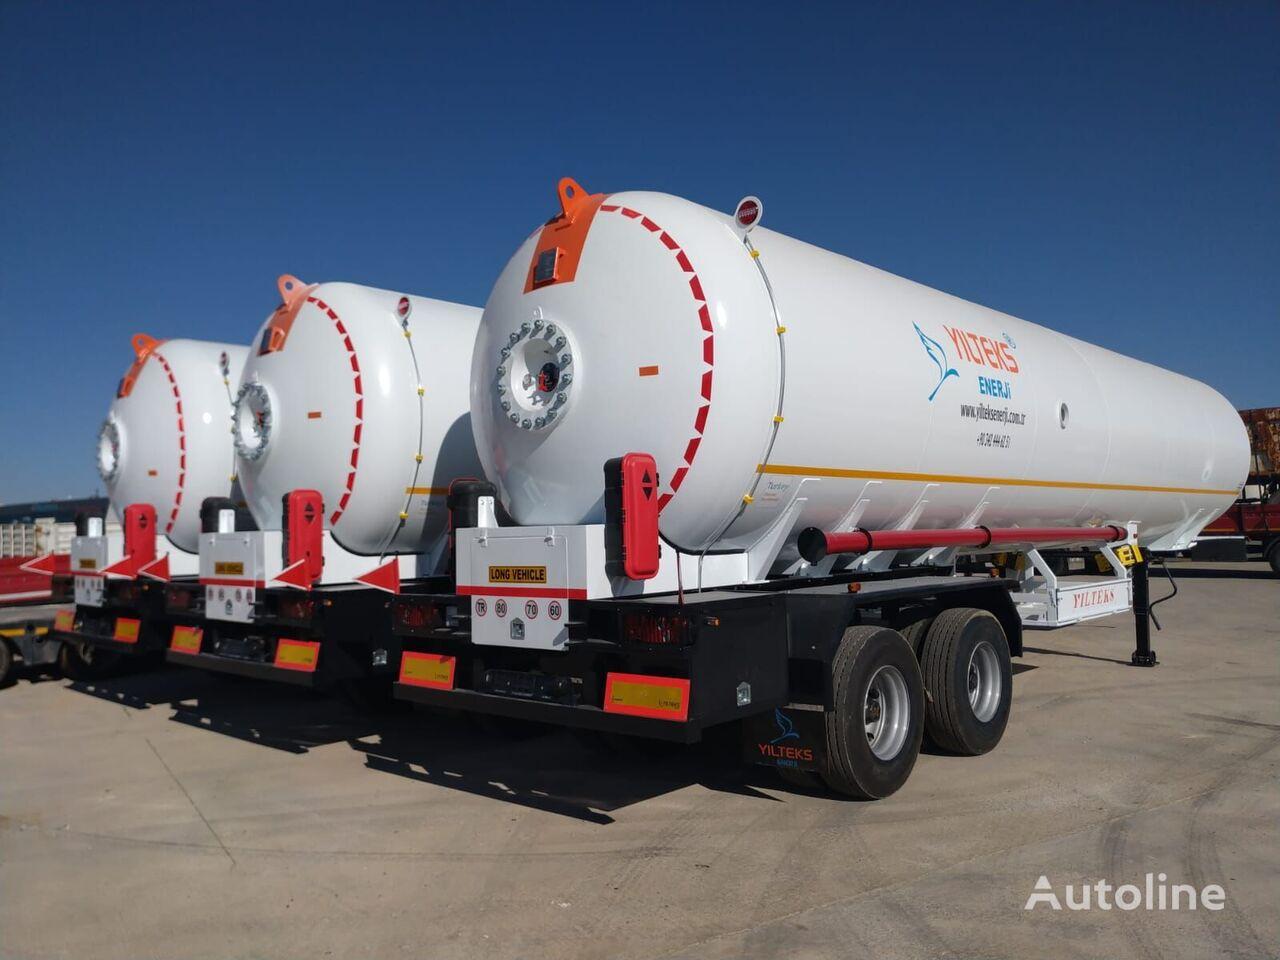 jauns YILTEKS  LPG Transport Tank gāzes cisterna